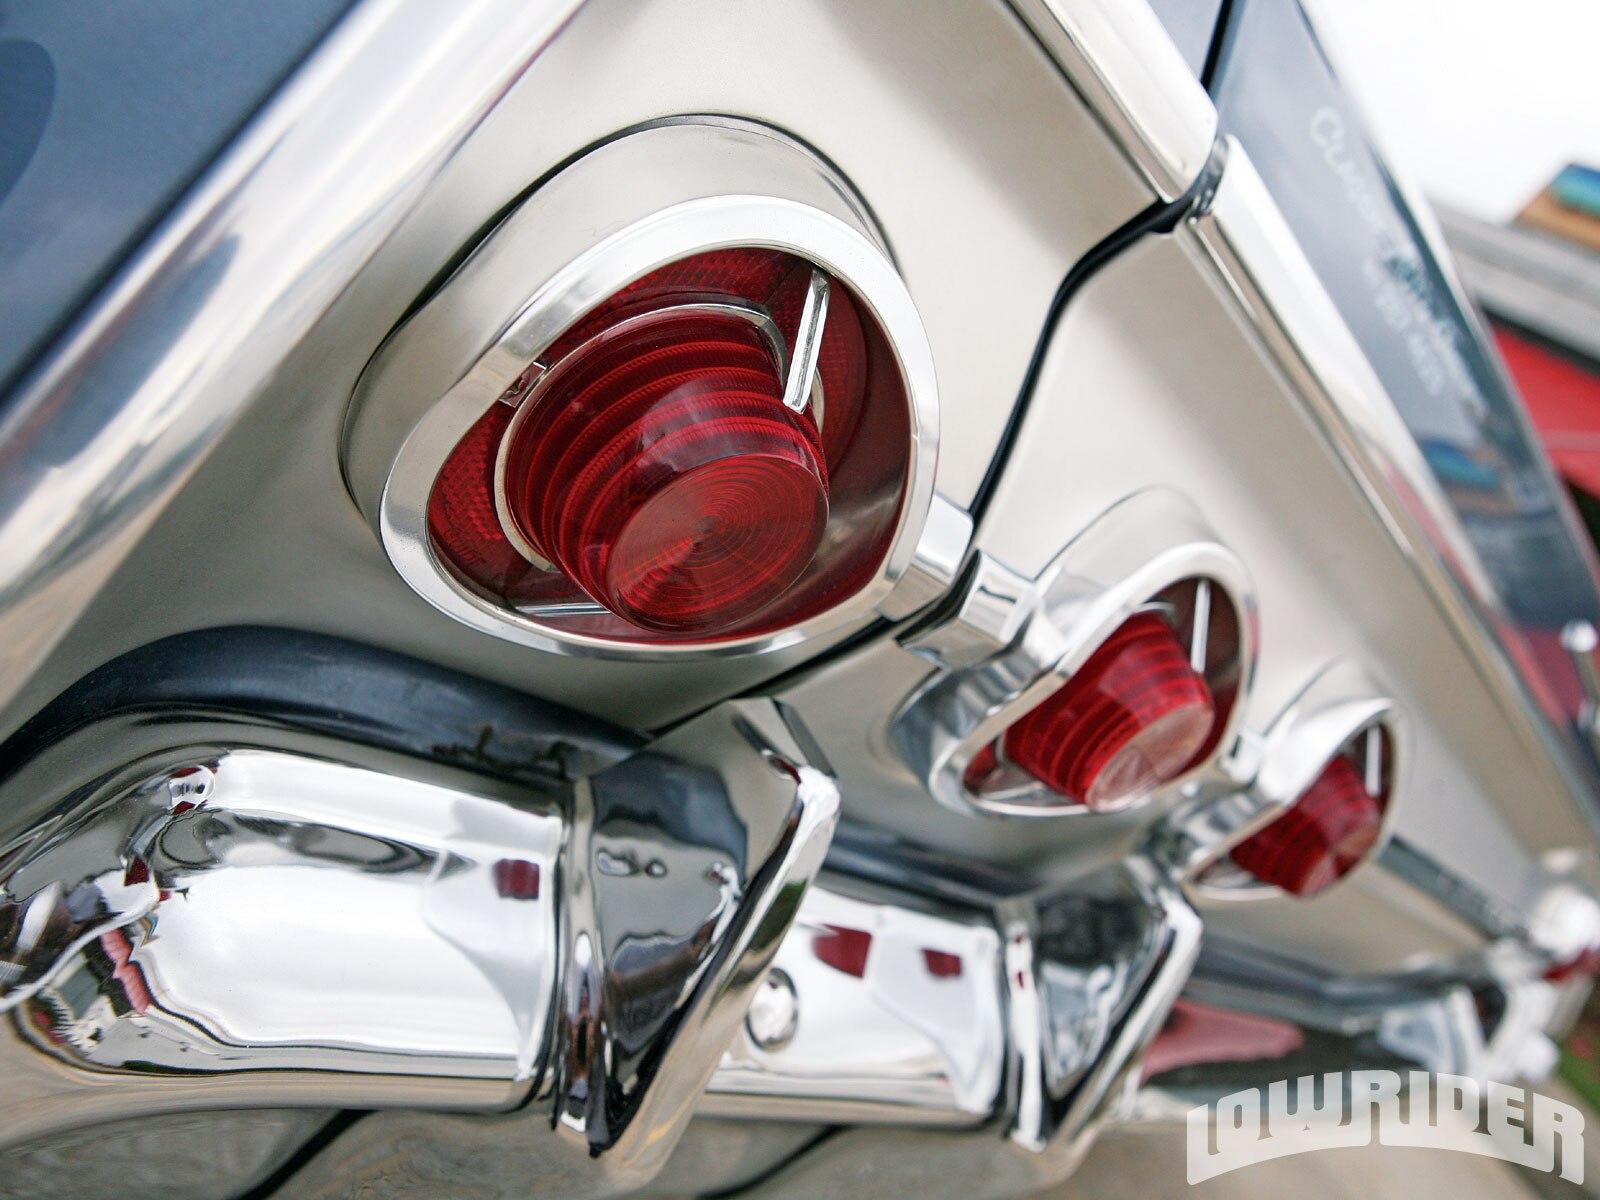 lrmp_1012_01_o-1962_chevrolet_impala-rear_tail_lights3